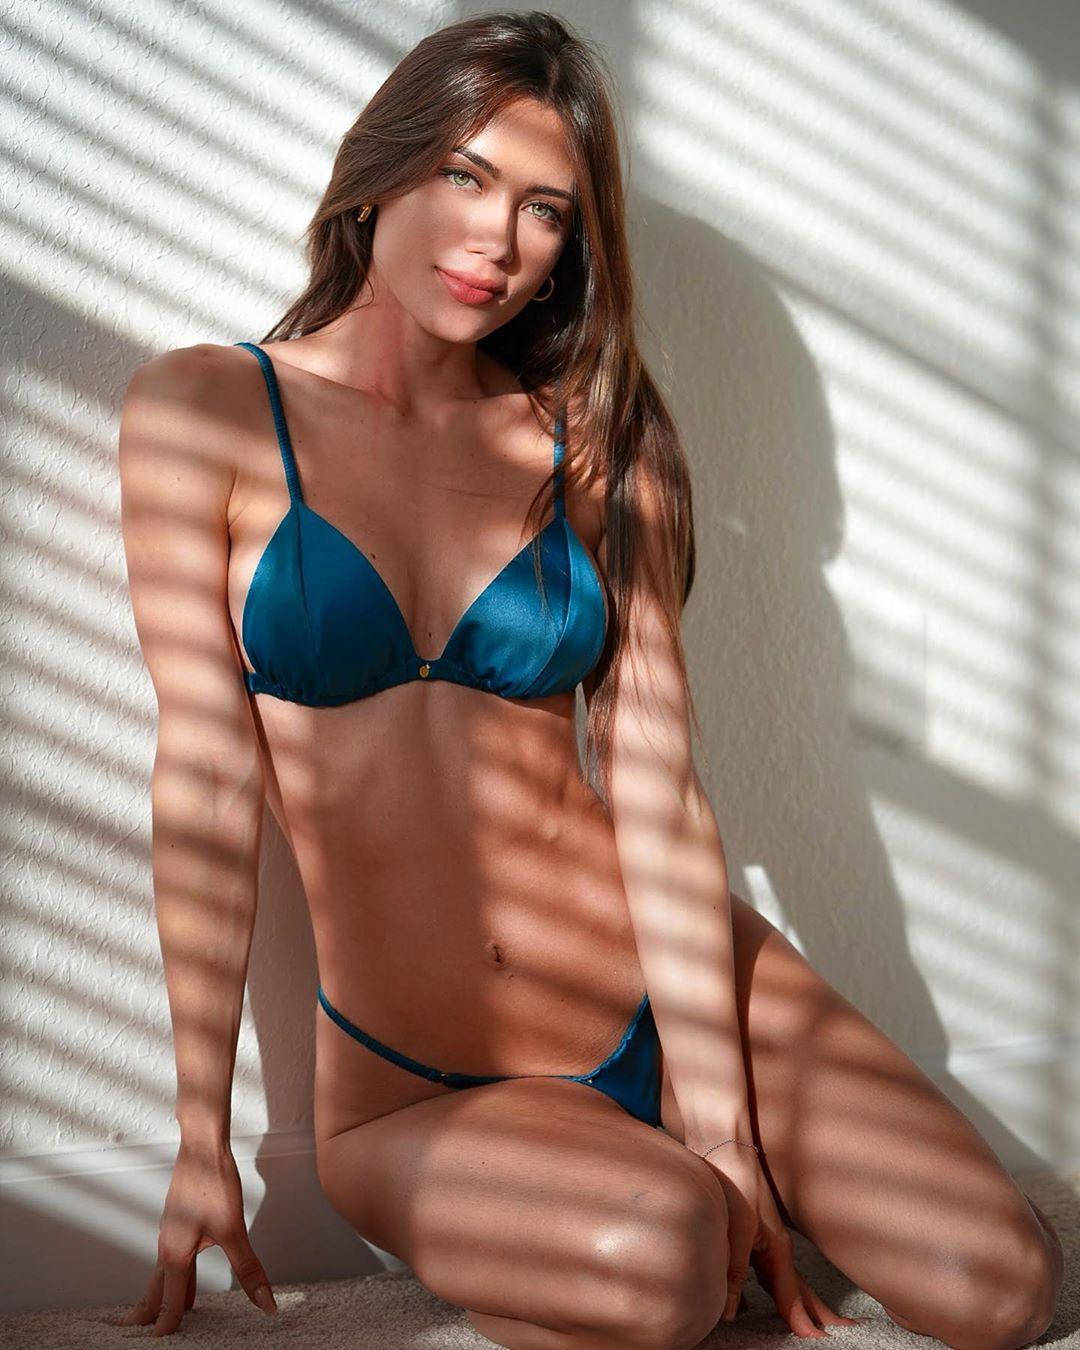 Georgina Mazzeo undergarment, lingerie, bikini underpants matching ideas for girls